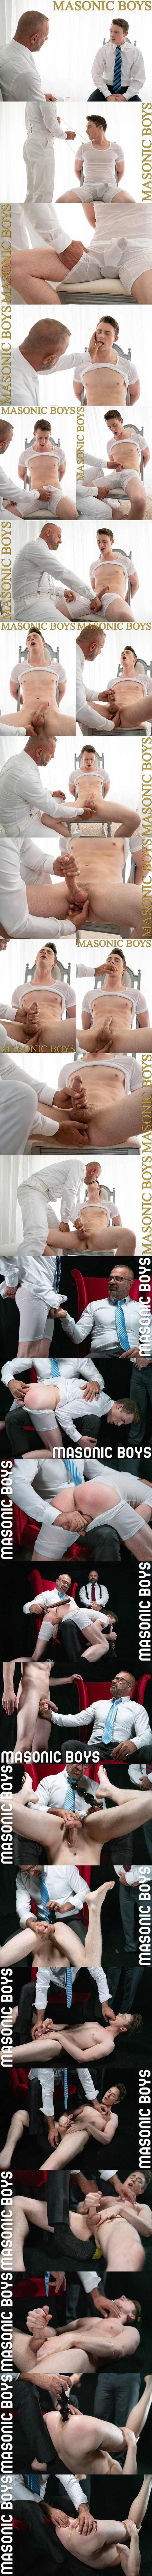 Masonicboys - masculine, bearded daddy Master Kamp (aka Felix Kamp) fingers and dildo-fucks cute twink Apprentice Blue (aka Cole Blue) in two fetish scenes 02